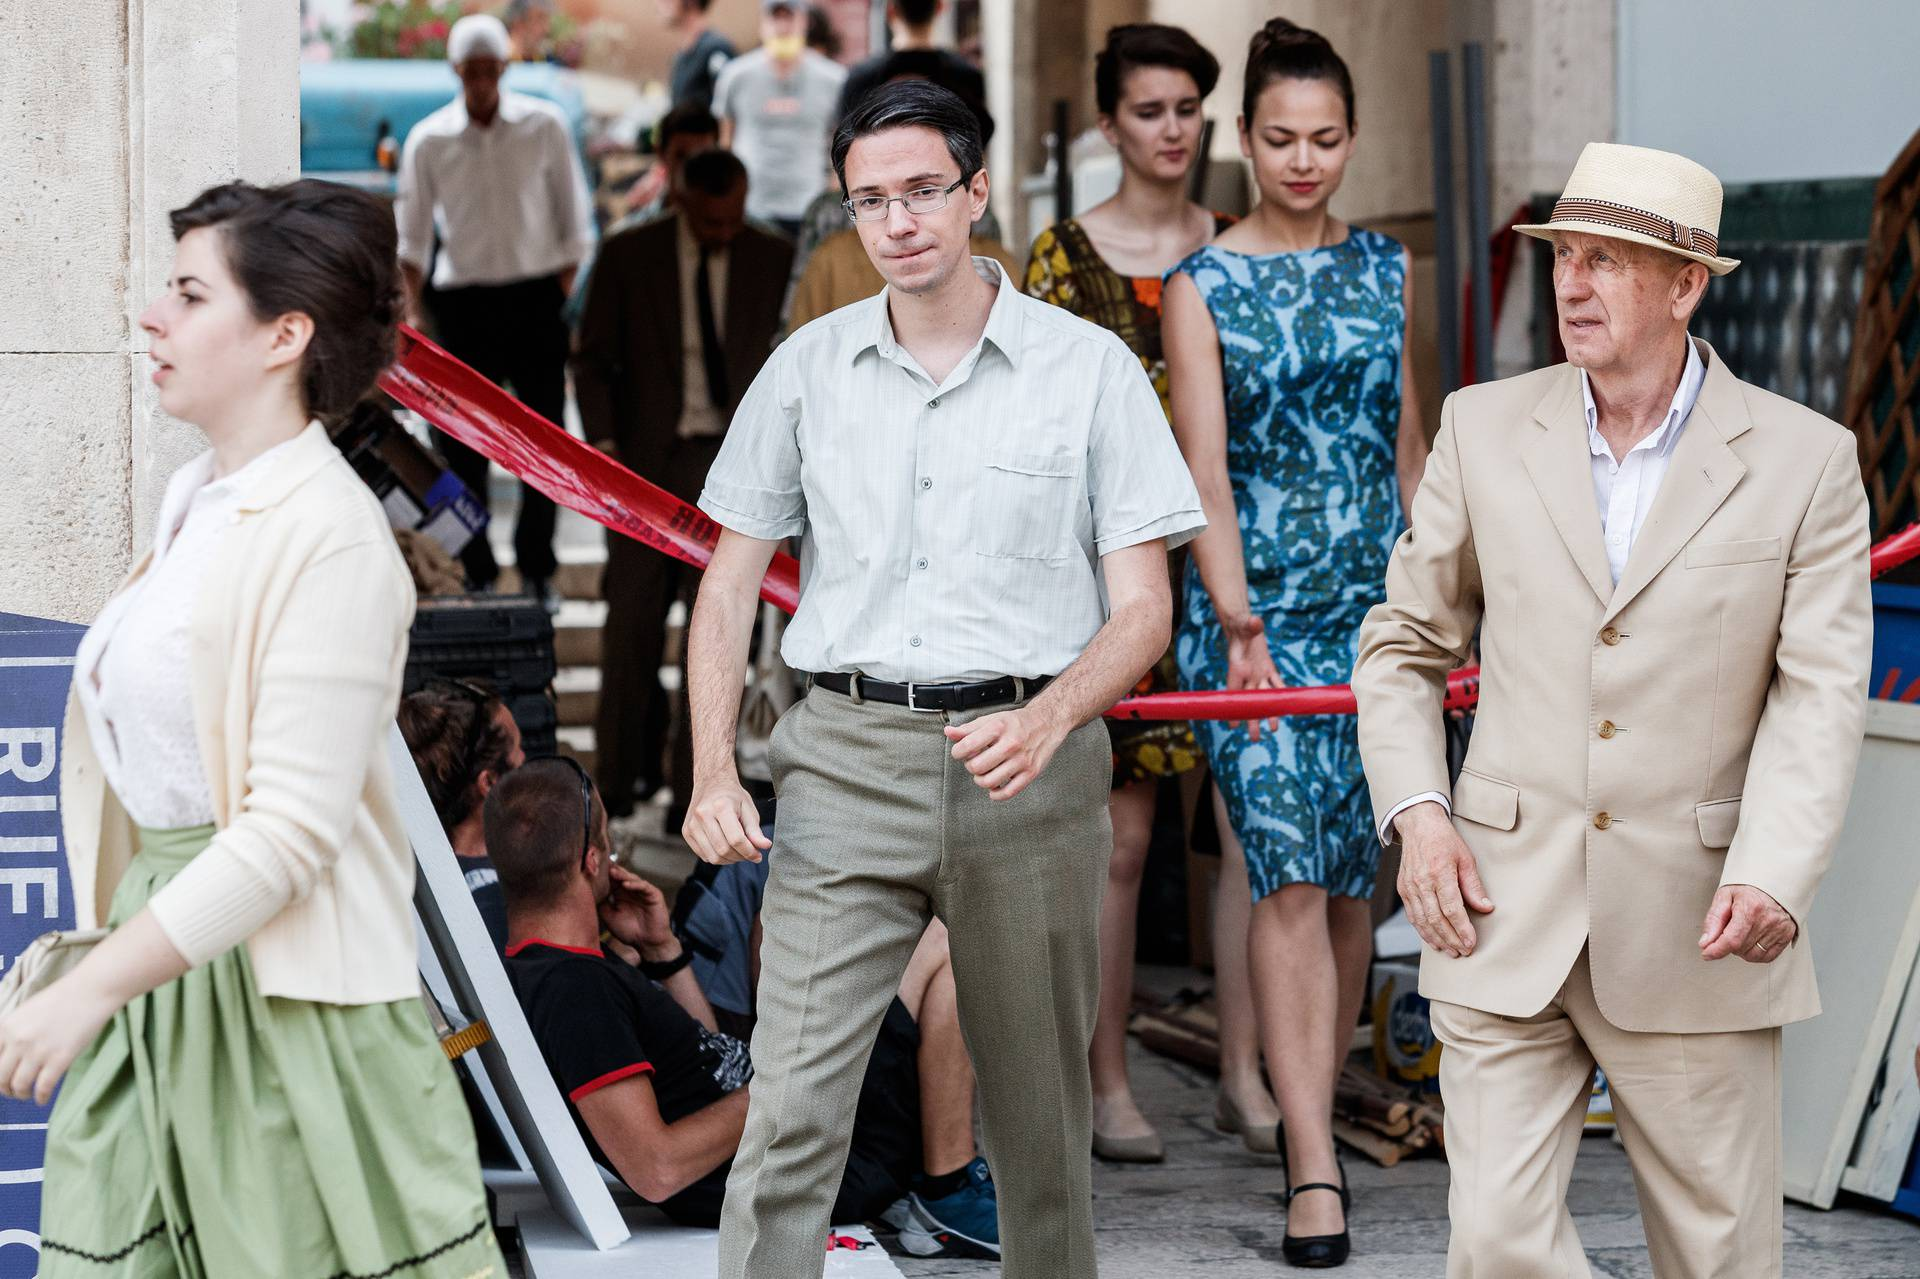 Snimaju se kadrovi britanske serije, Split okupirali oldtajmeri